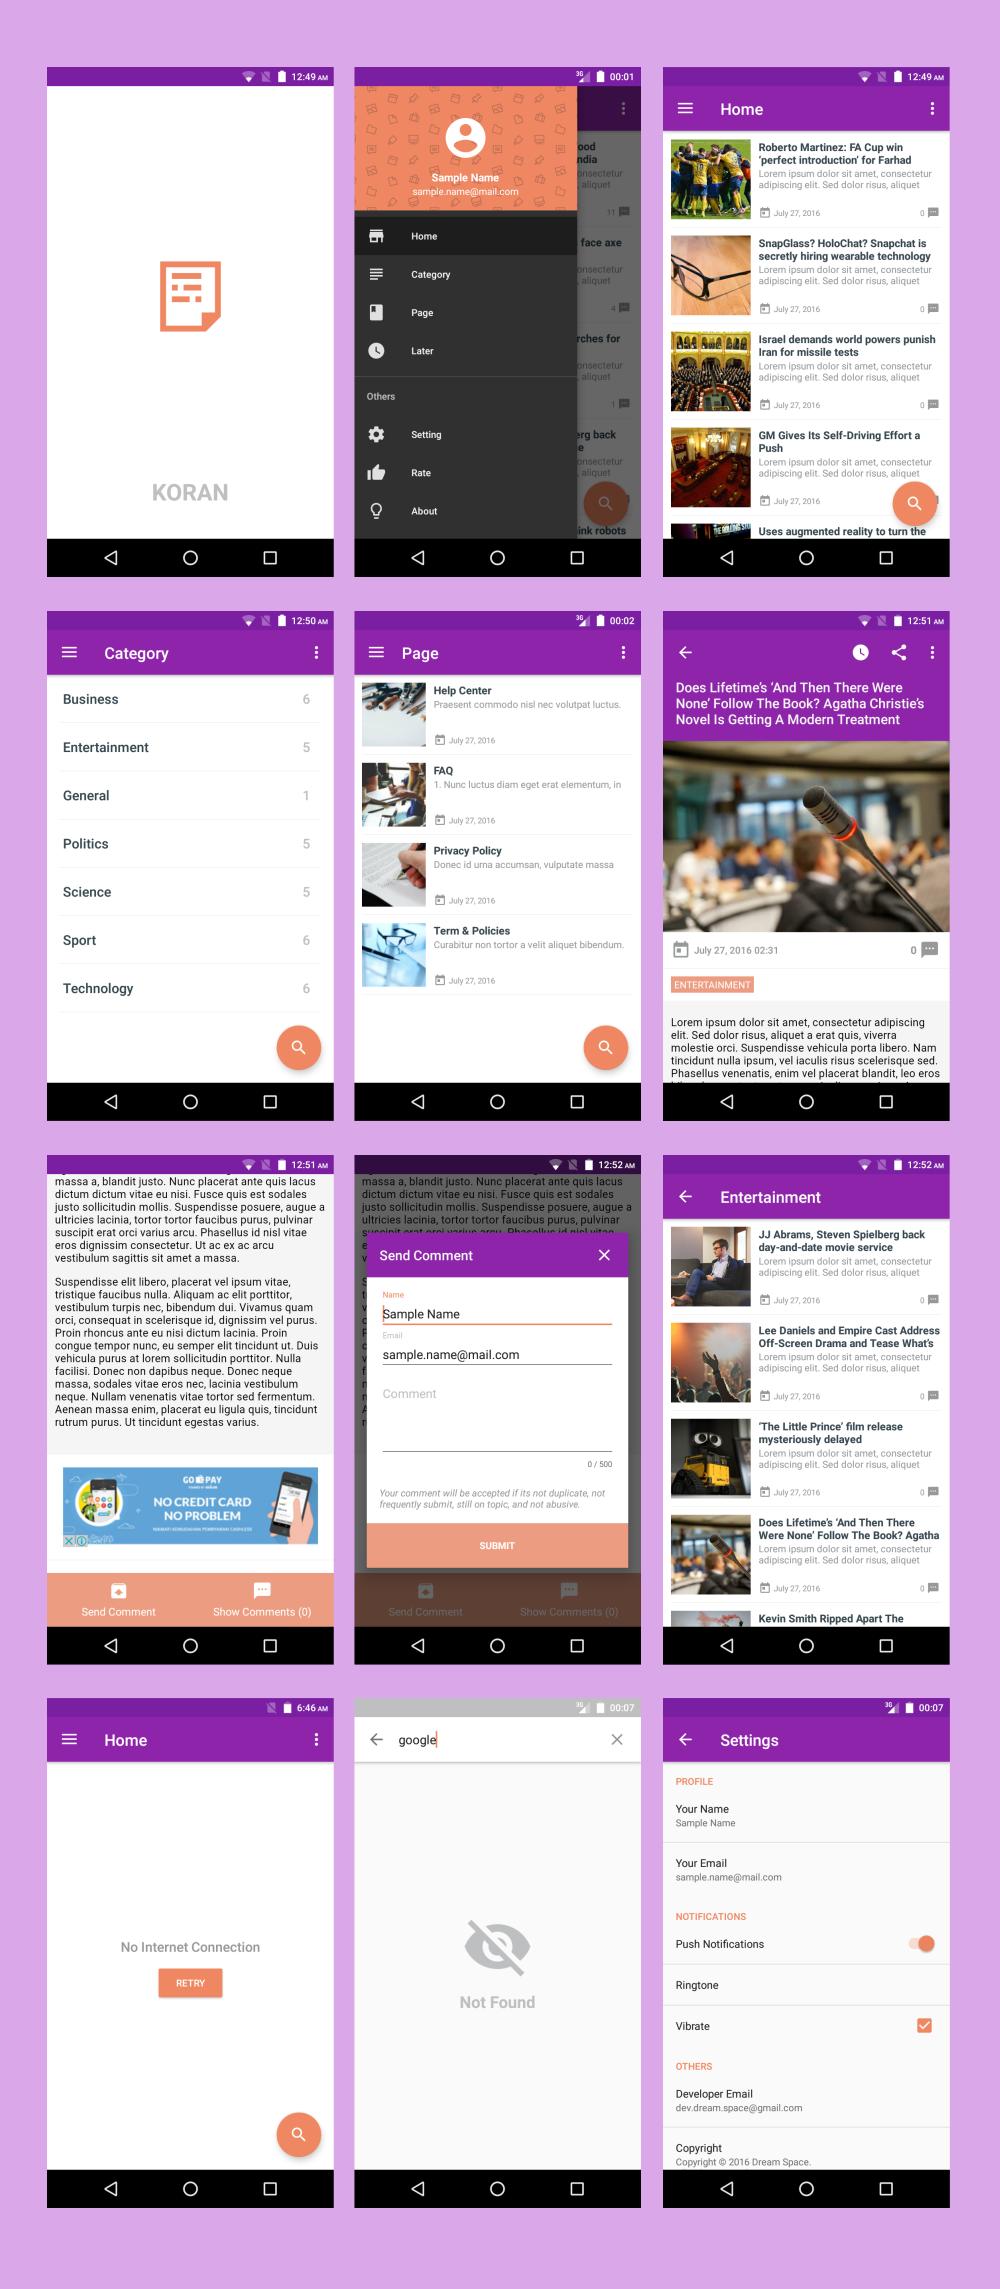 Koran - Wordpress App with Push Notification 3 5